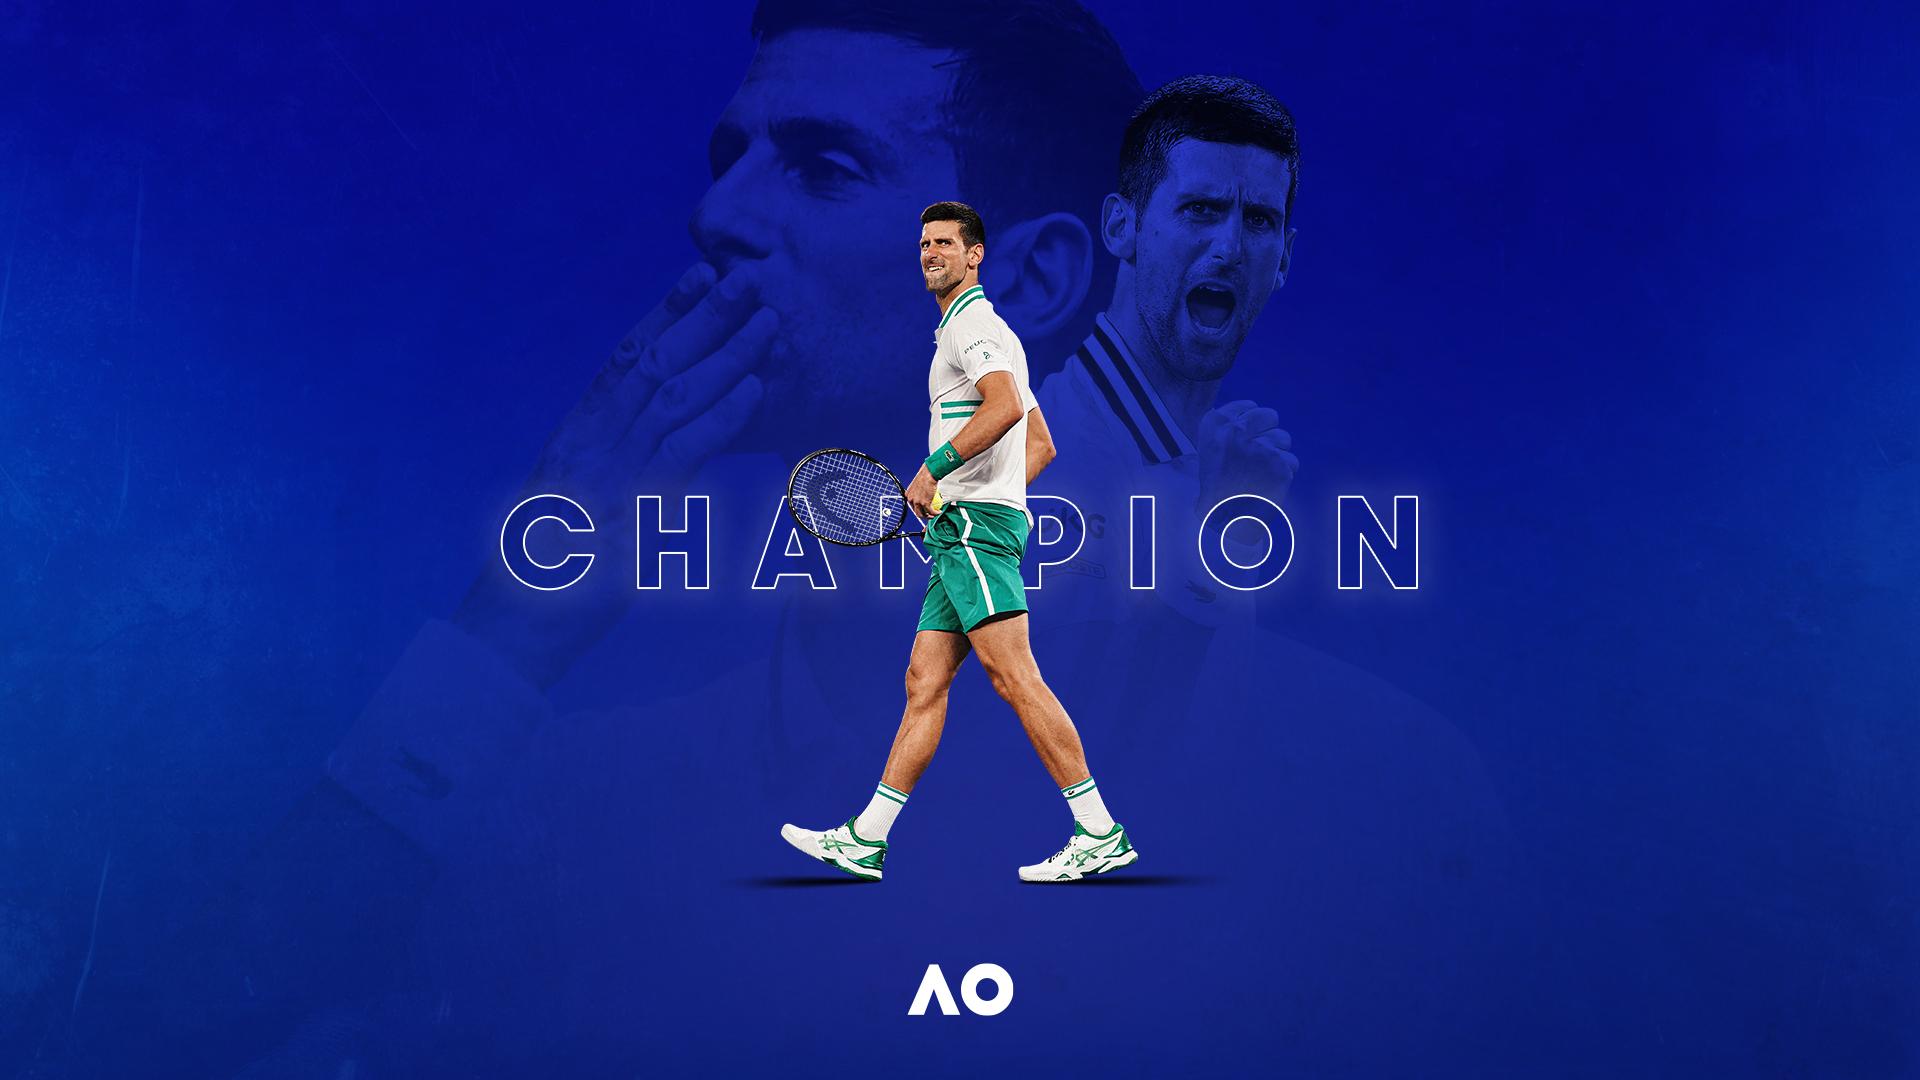 Graphic of Novak Djokovic, the 2021 Australian Open Men's Singles champion.